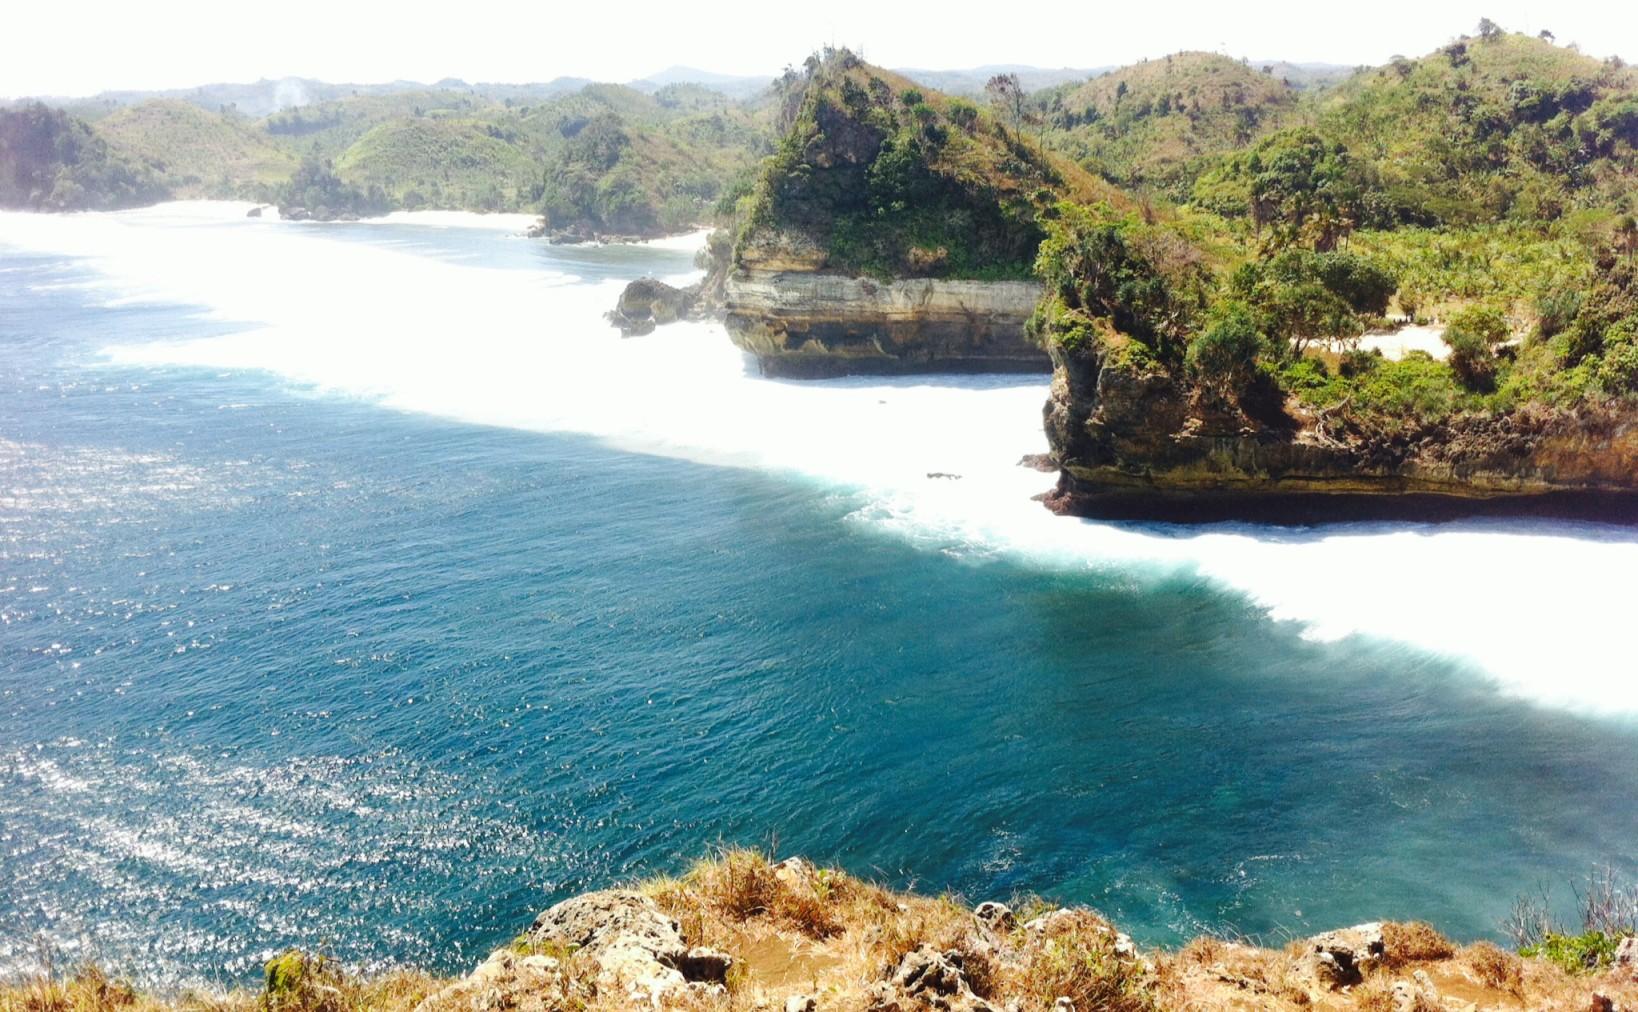 Mendaki Tebing Karang Pantai Batu Bengkung Ngalam Detail Eksotisnya Www